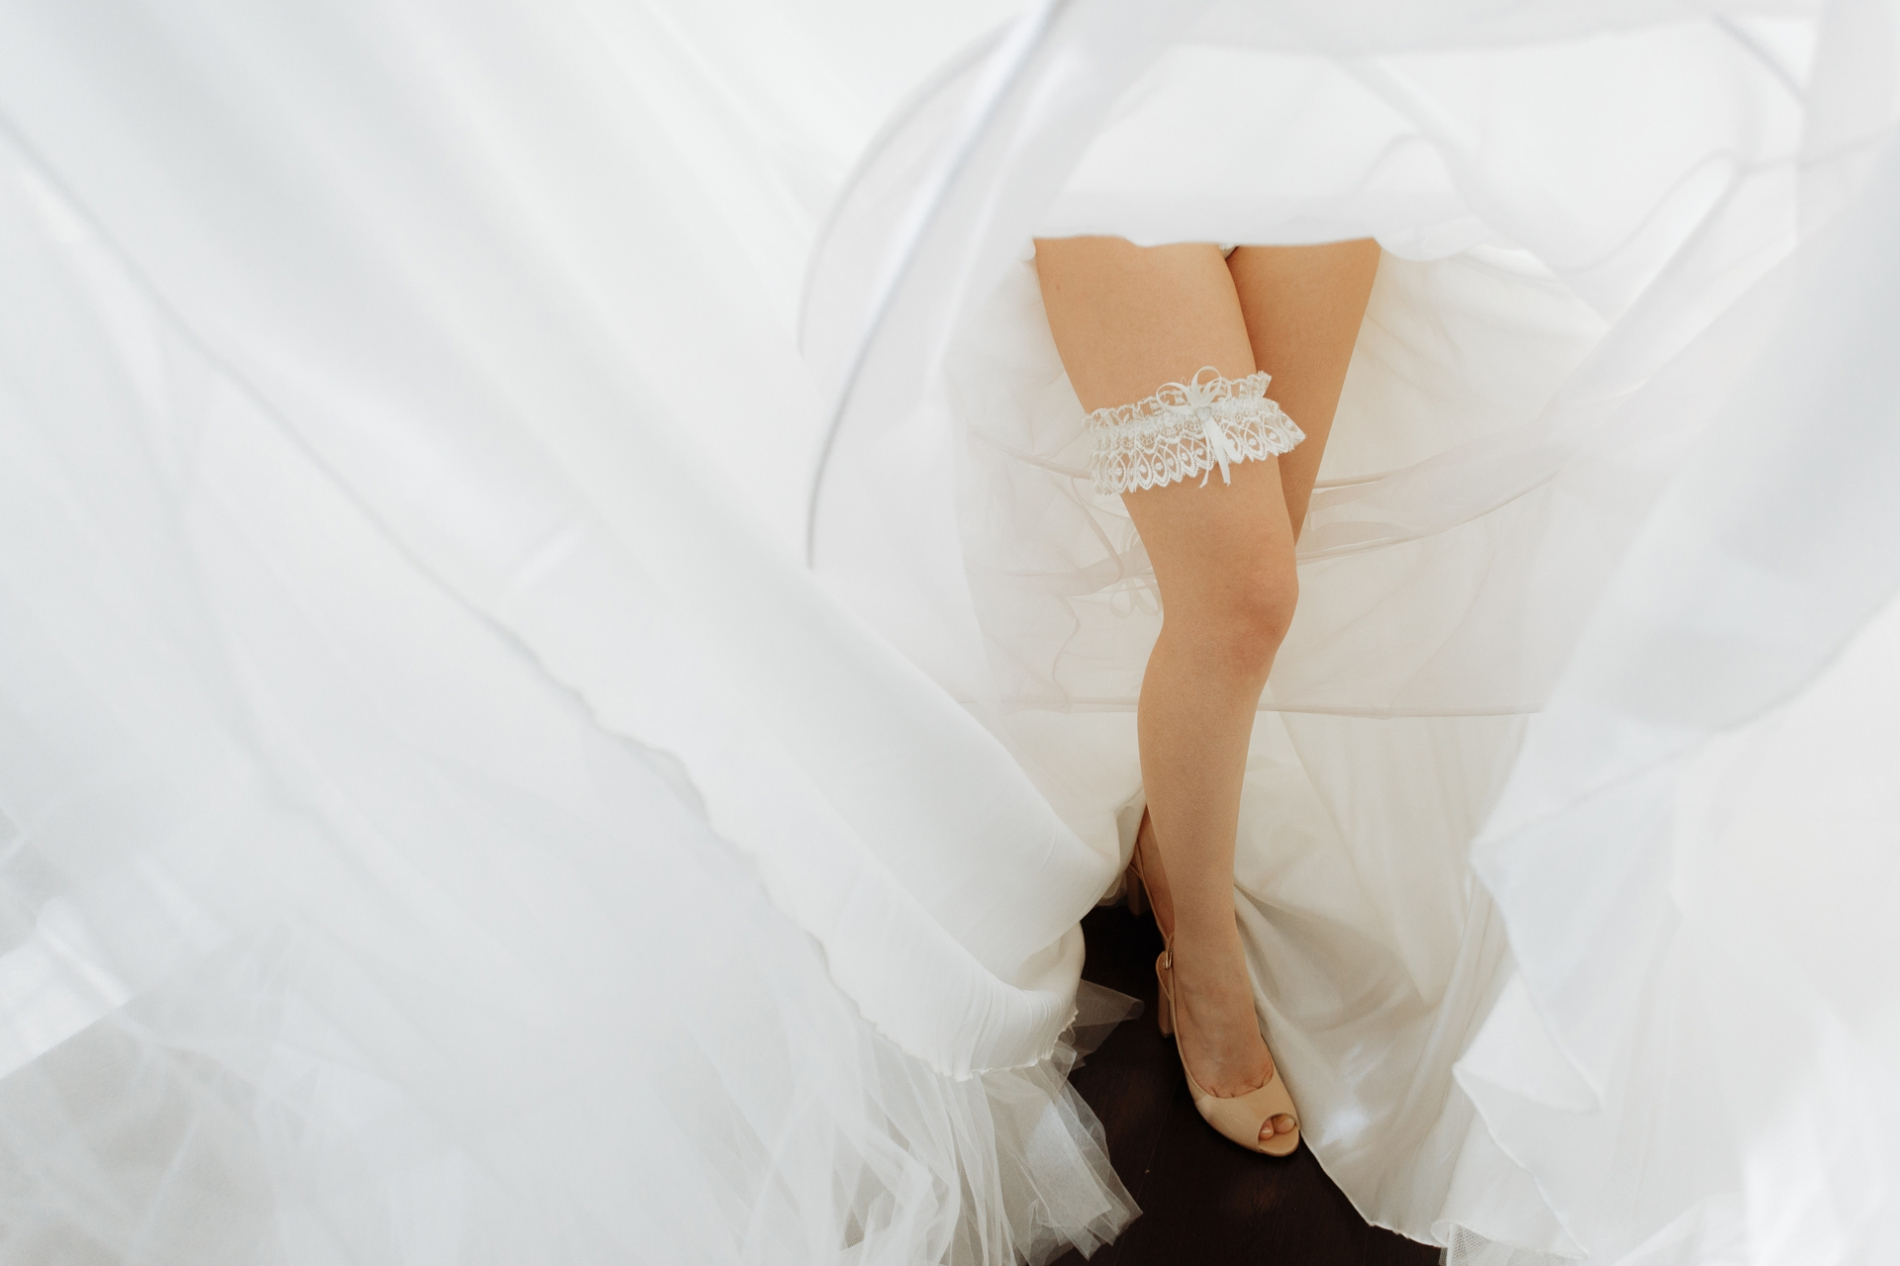 Boudoir-Hochzeit-08-Kristin-Leske.jpeg